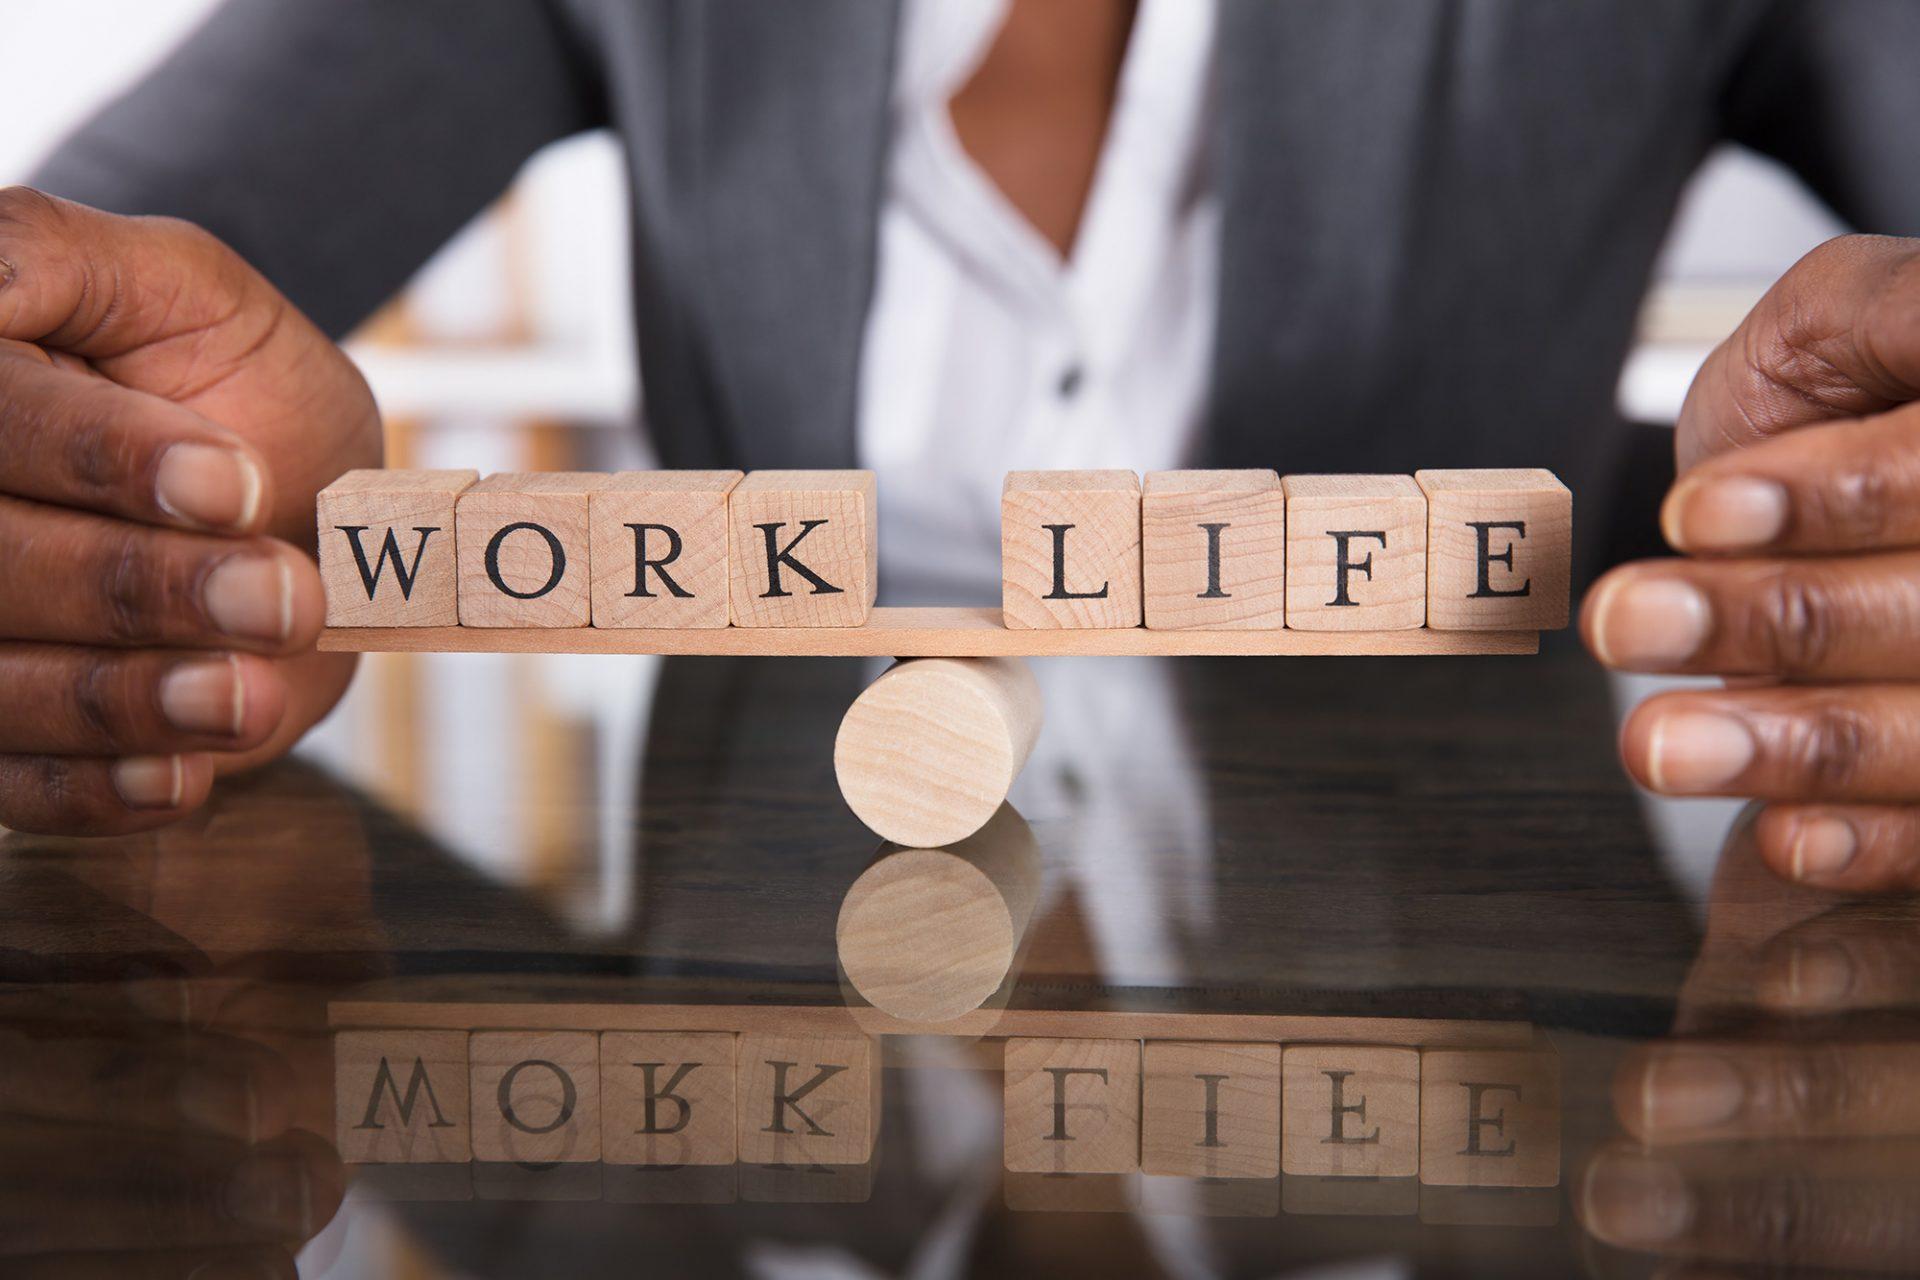 10 tips for better work-life balance | Healthspectra